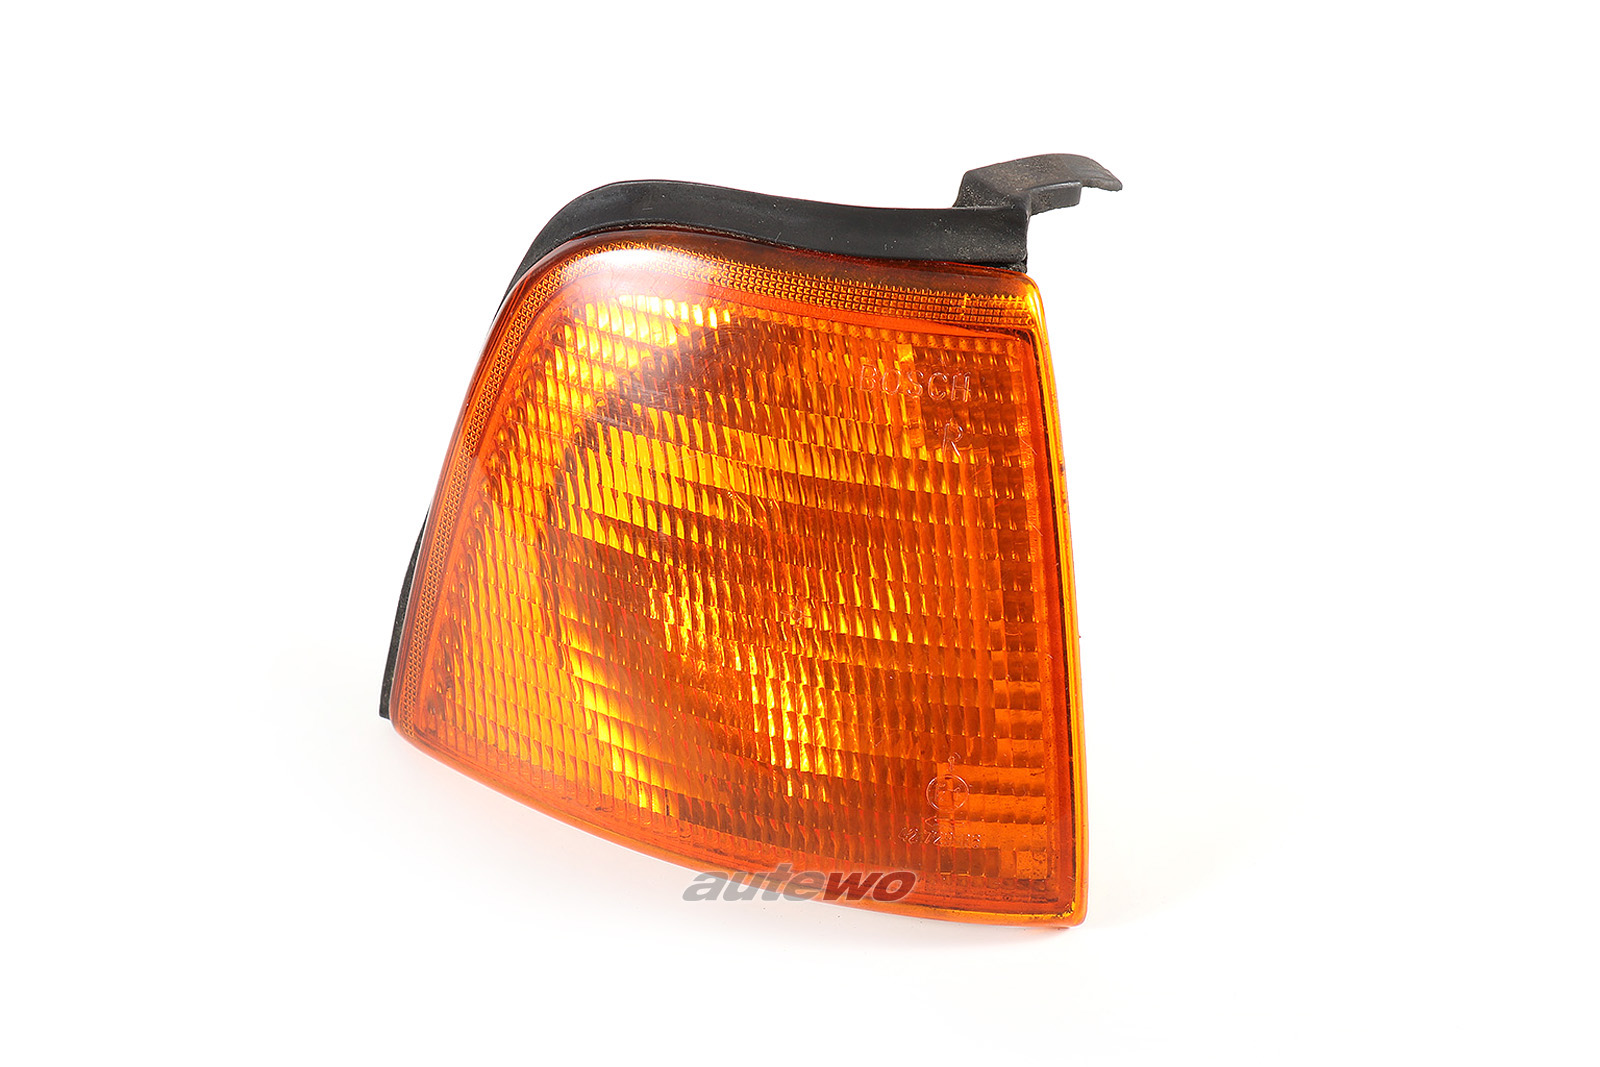 893953050 Bosch 1 305 230 907 Audi 80 Typ 89 Blinker Vorne Rechts orange